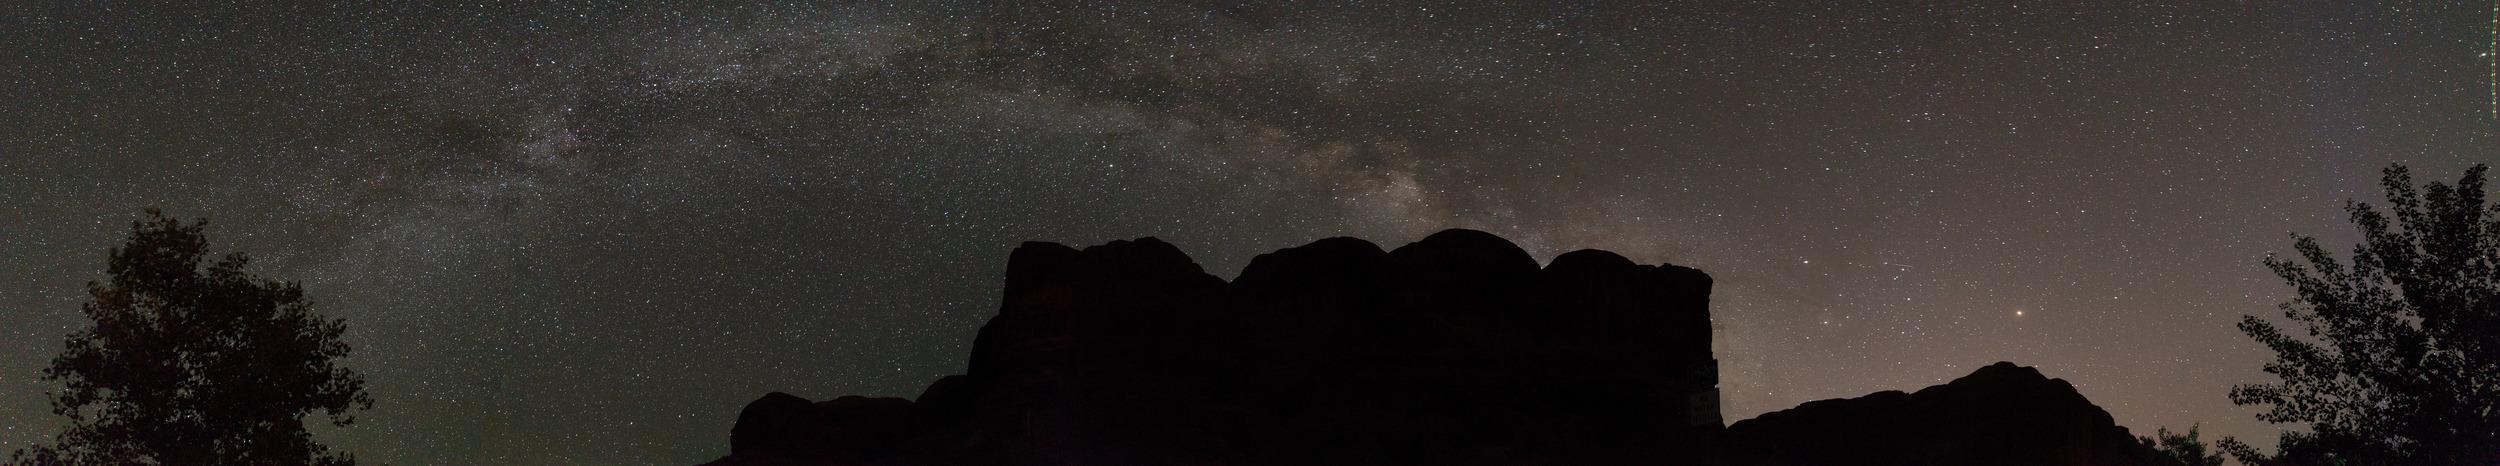 10twelve-photography-moab-milky-way-stars.jpg